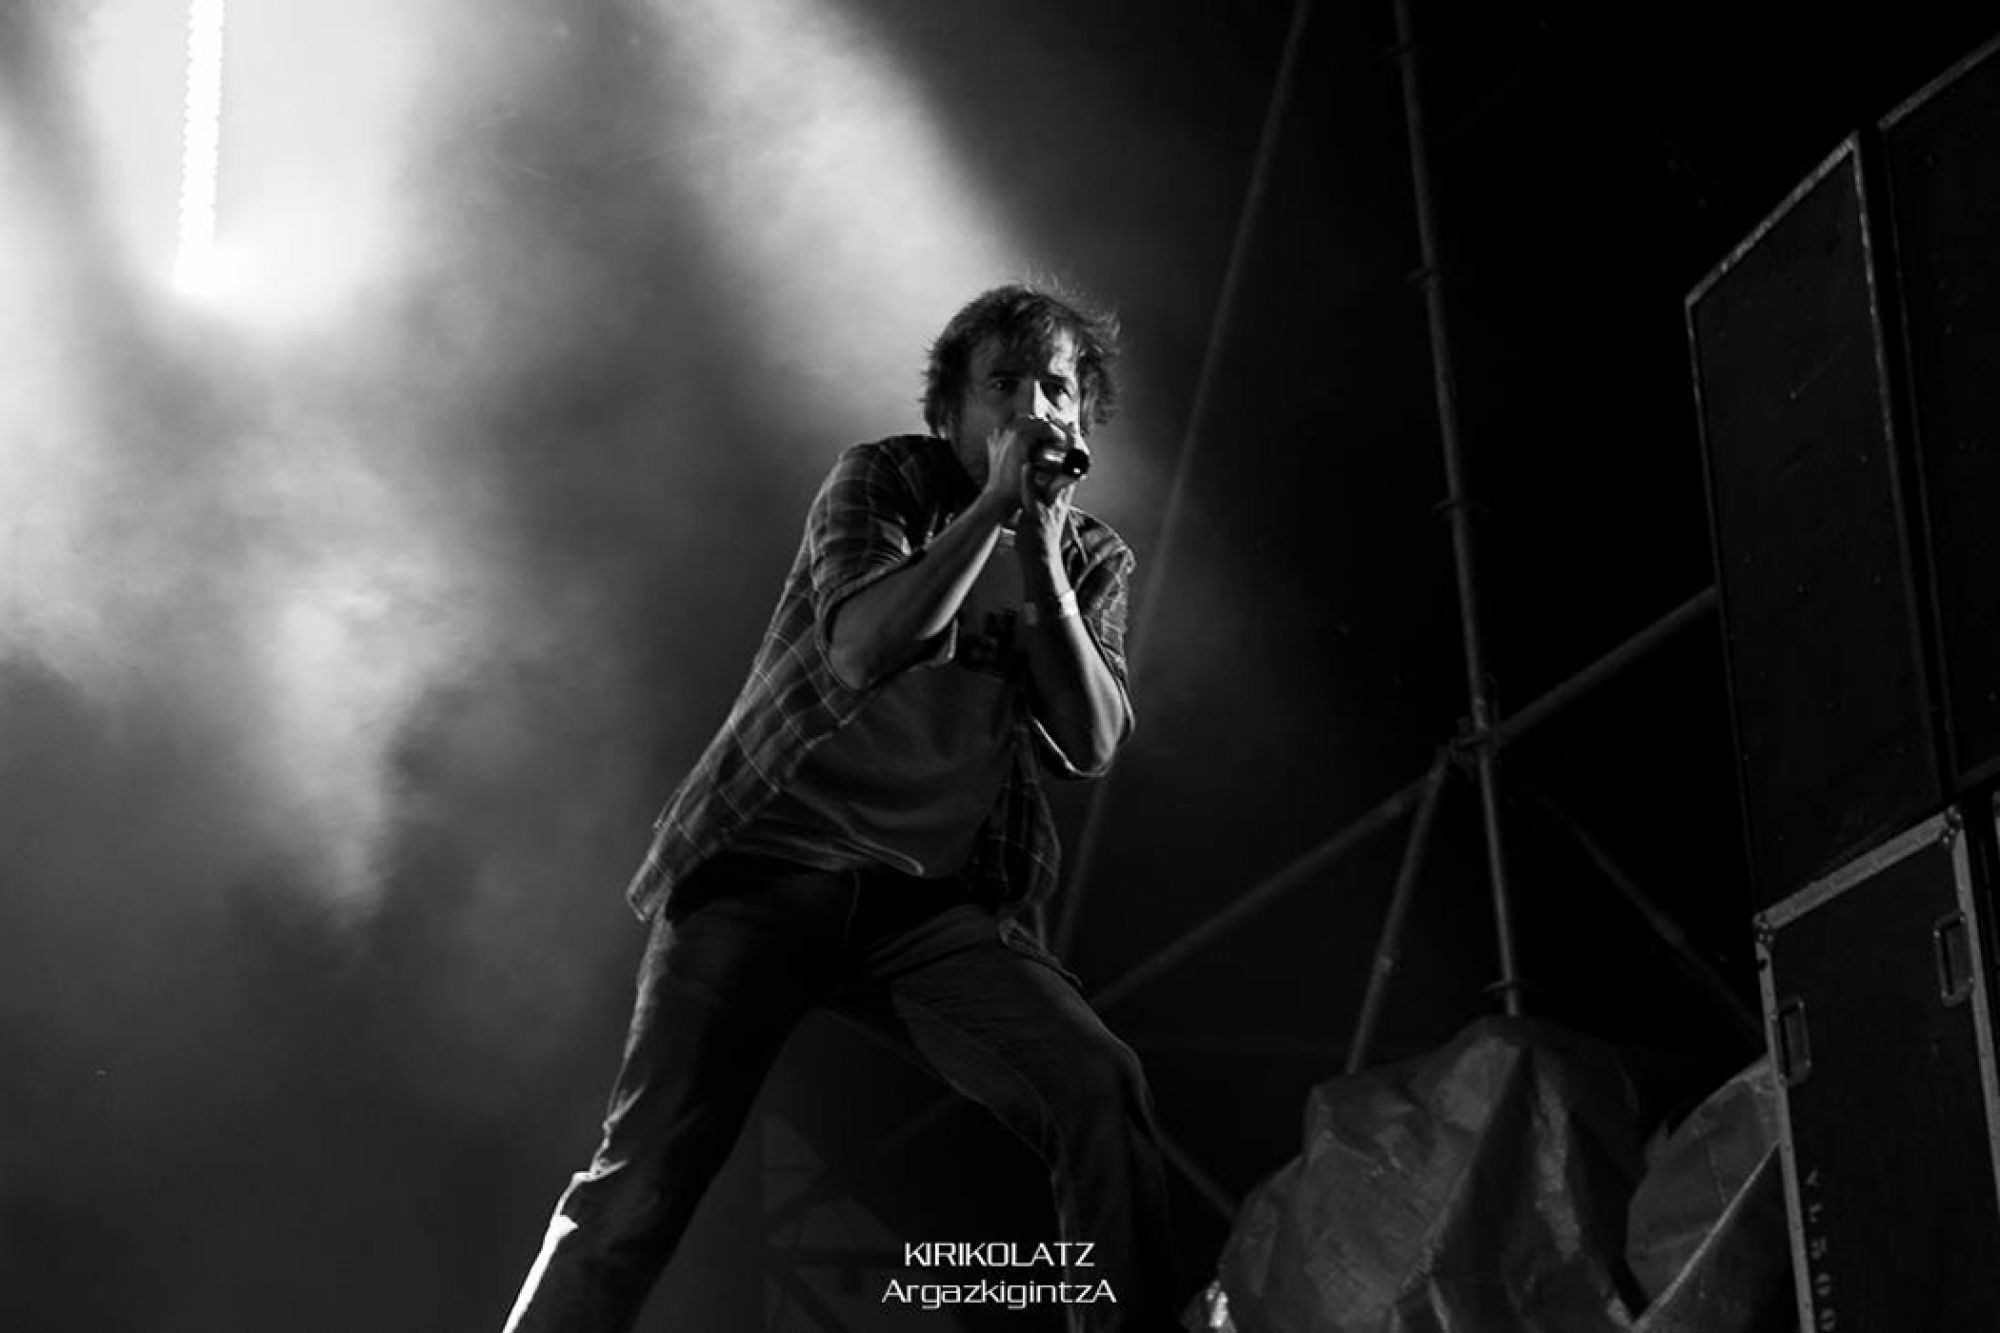 Fotógrafa profesional de conciertos